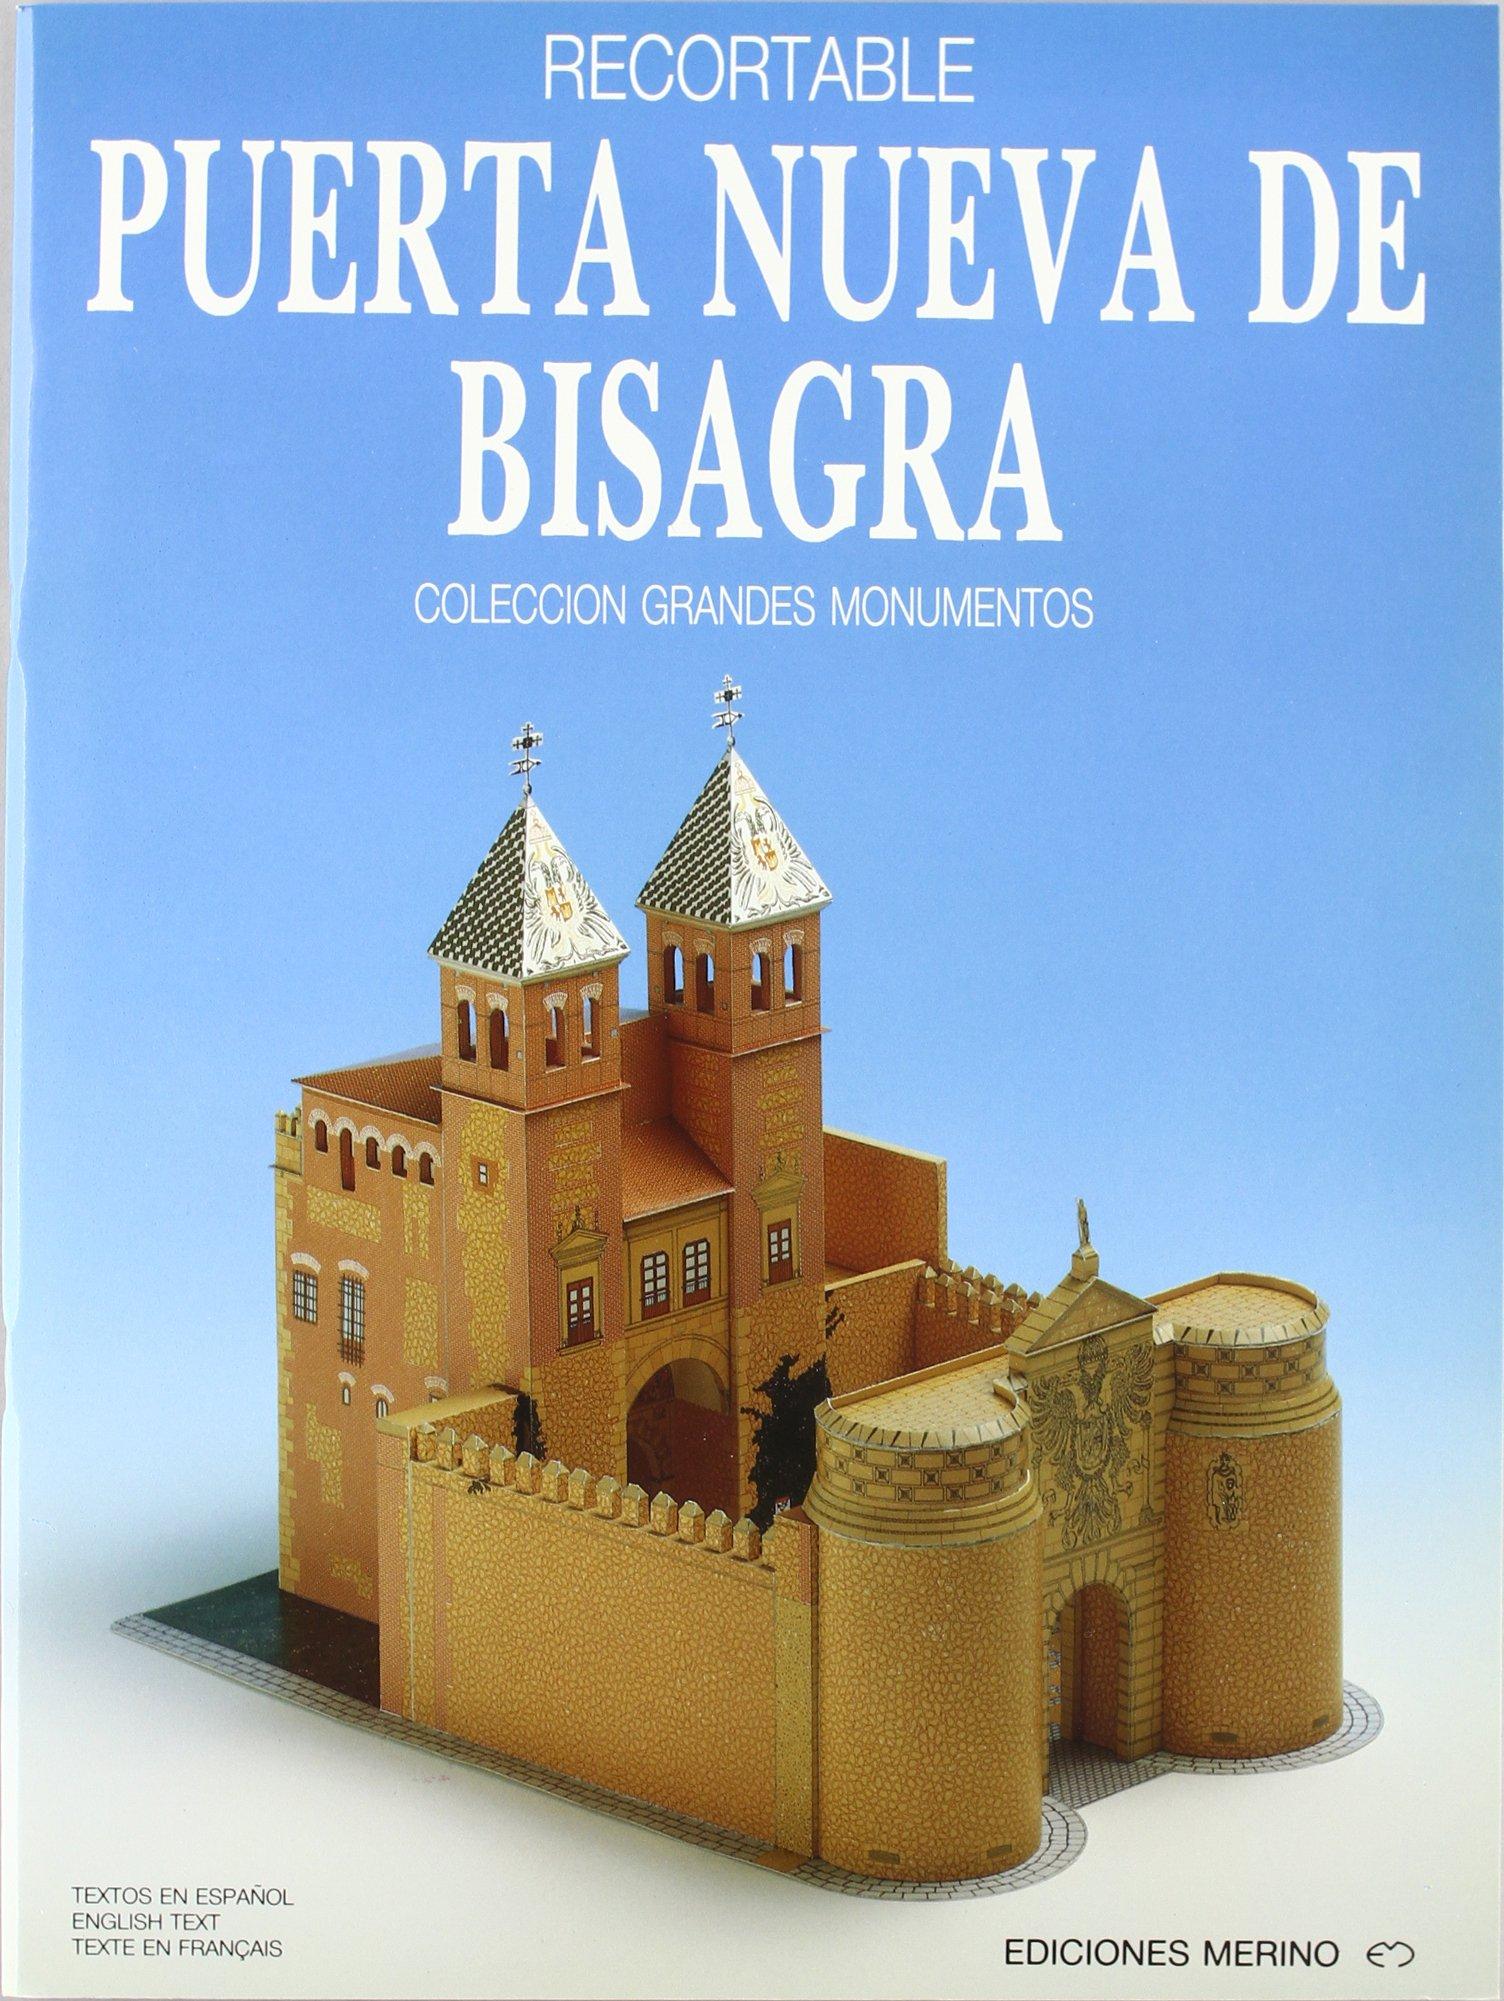 Puerta Nueva De Bisagra: 9788486912246: Amazon.com: Books